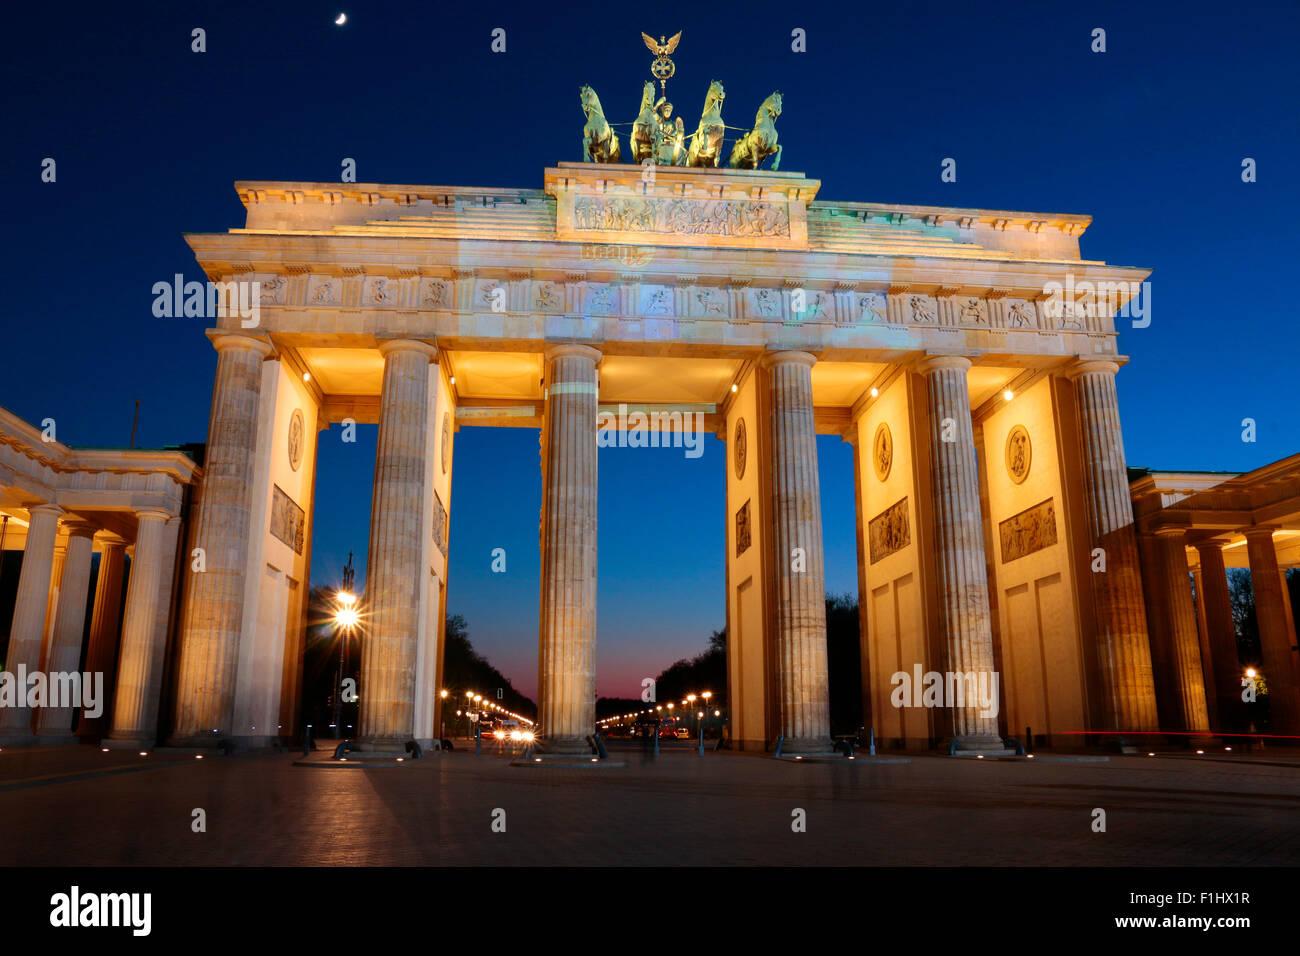 Pariser Platz Mit Dem Brandenburger Tor, Berlin-Mitte. Stockbild